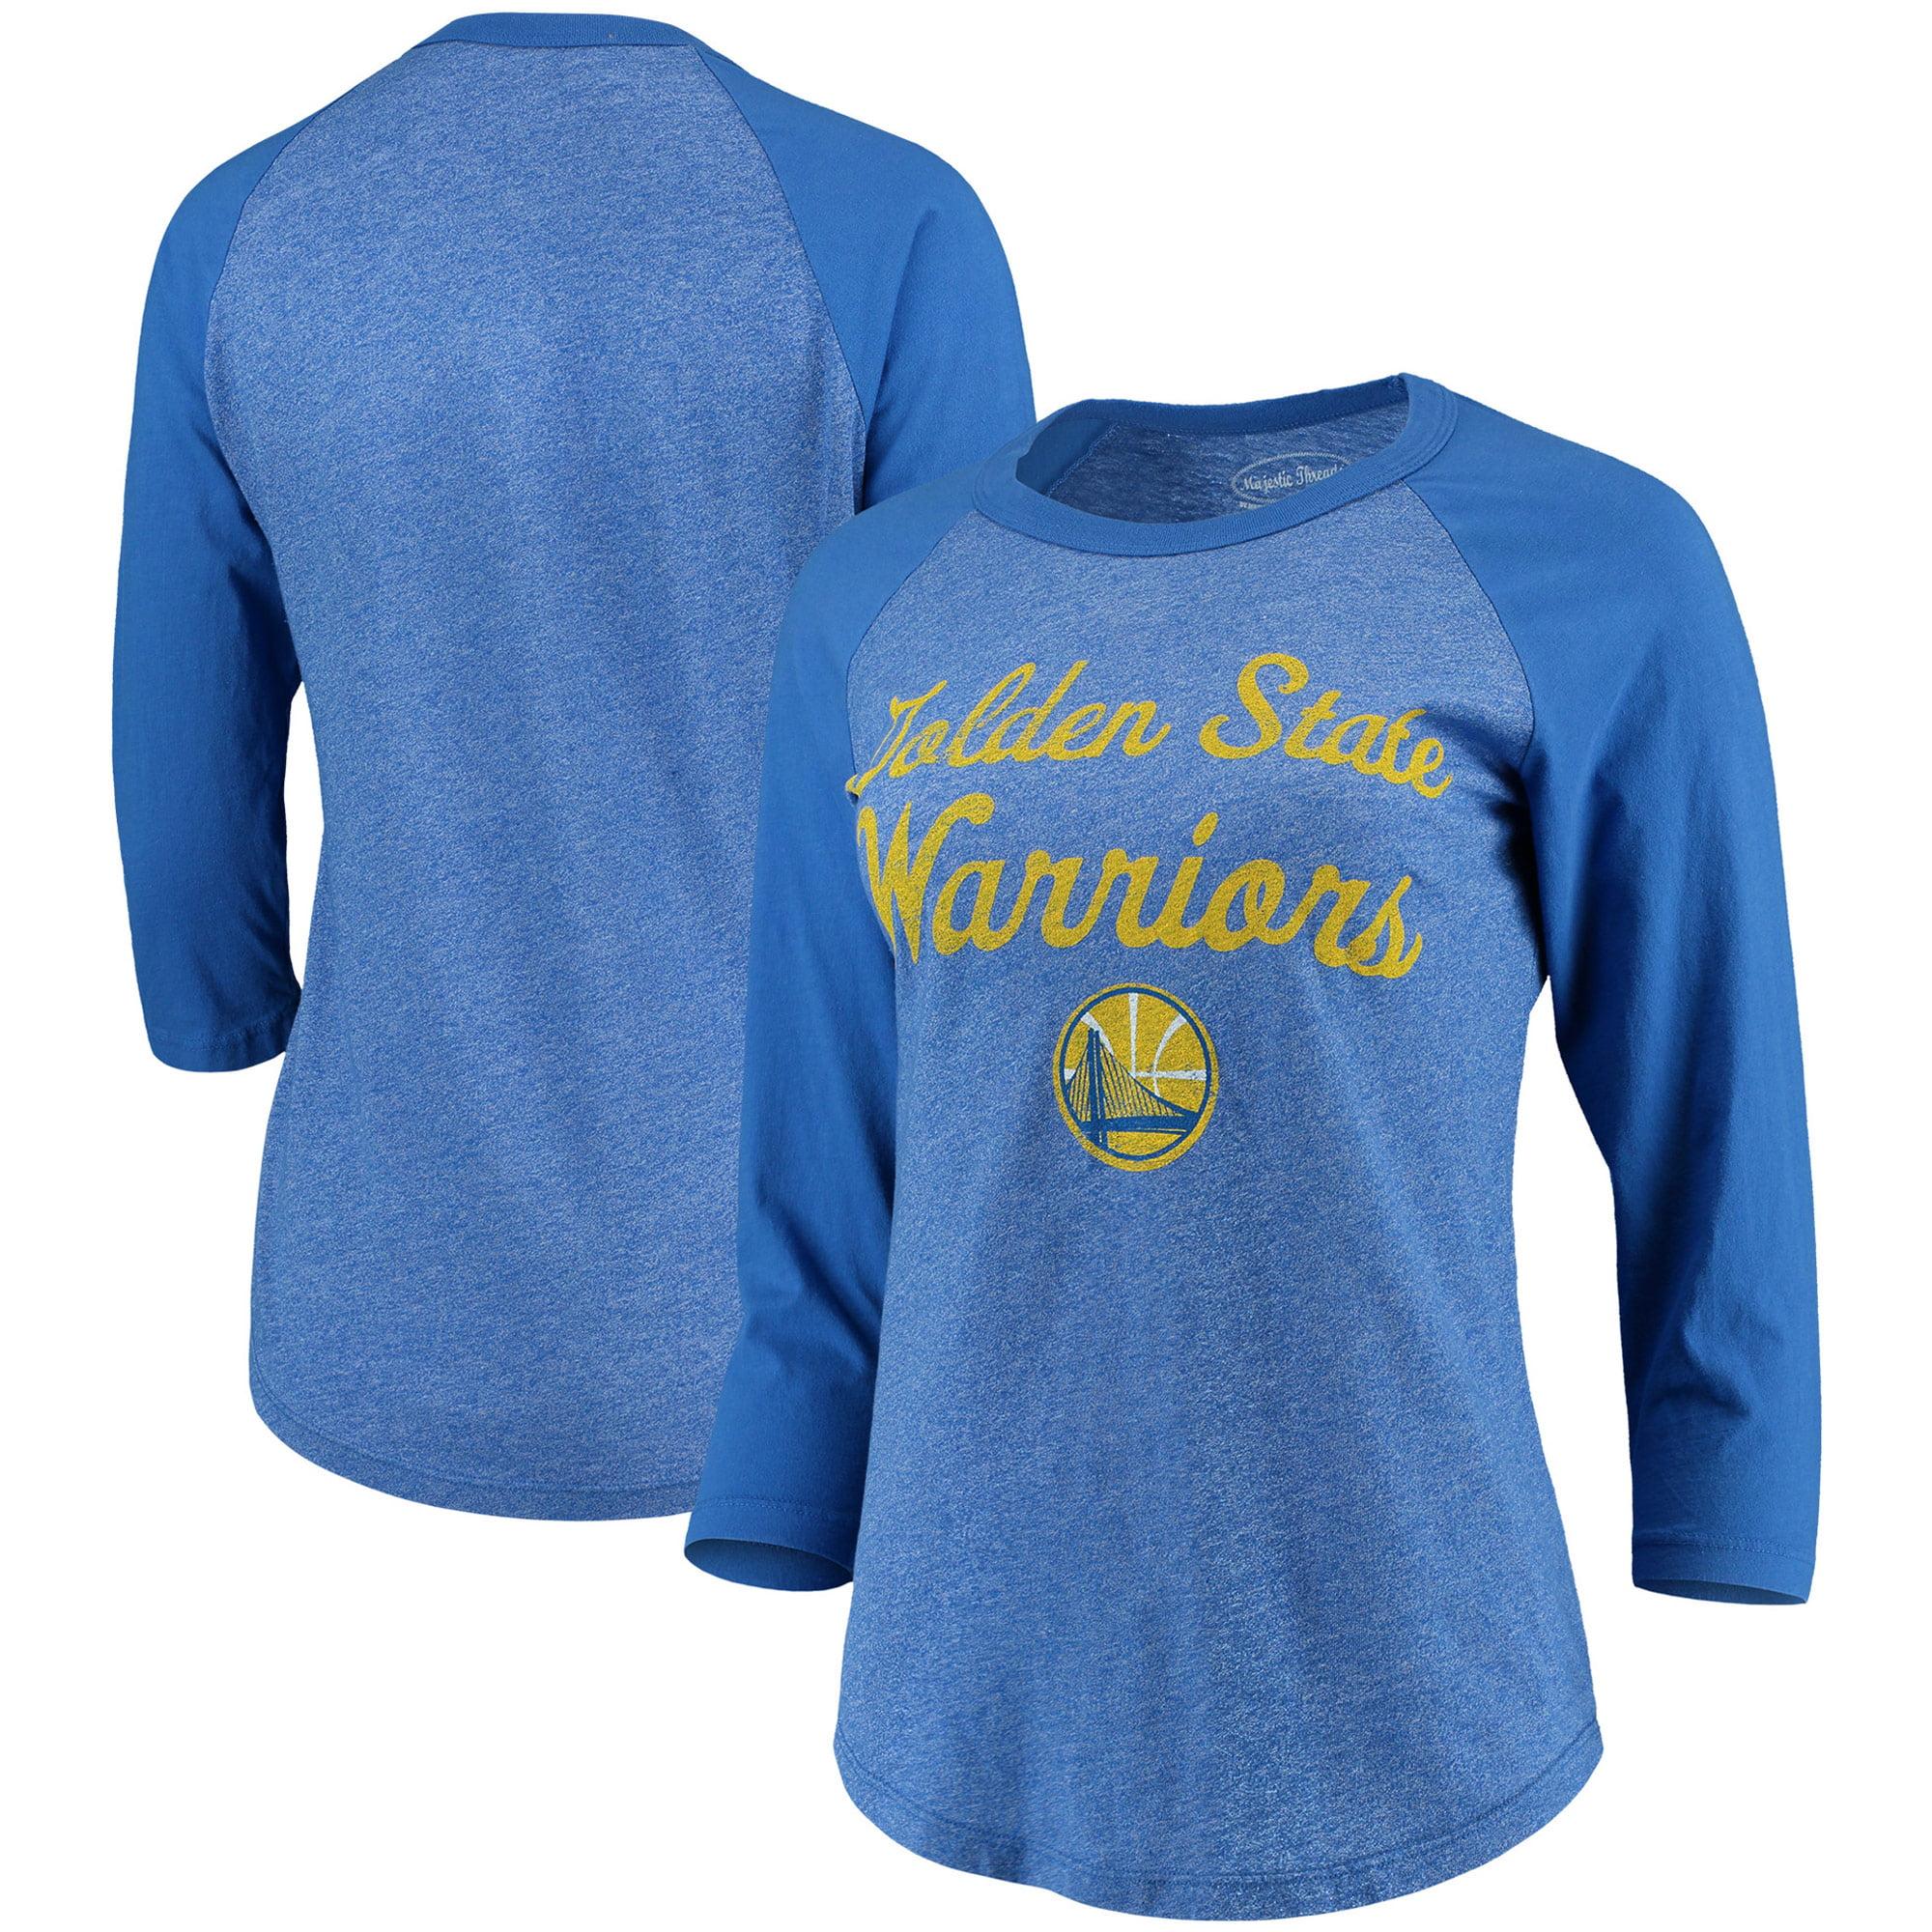 Golden State Warriors Majestic Threads Women's Double Dribble Raglan Tri-Blend 3/4-Sleeve T-Shirt - Heathered Royal/Royal